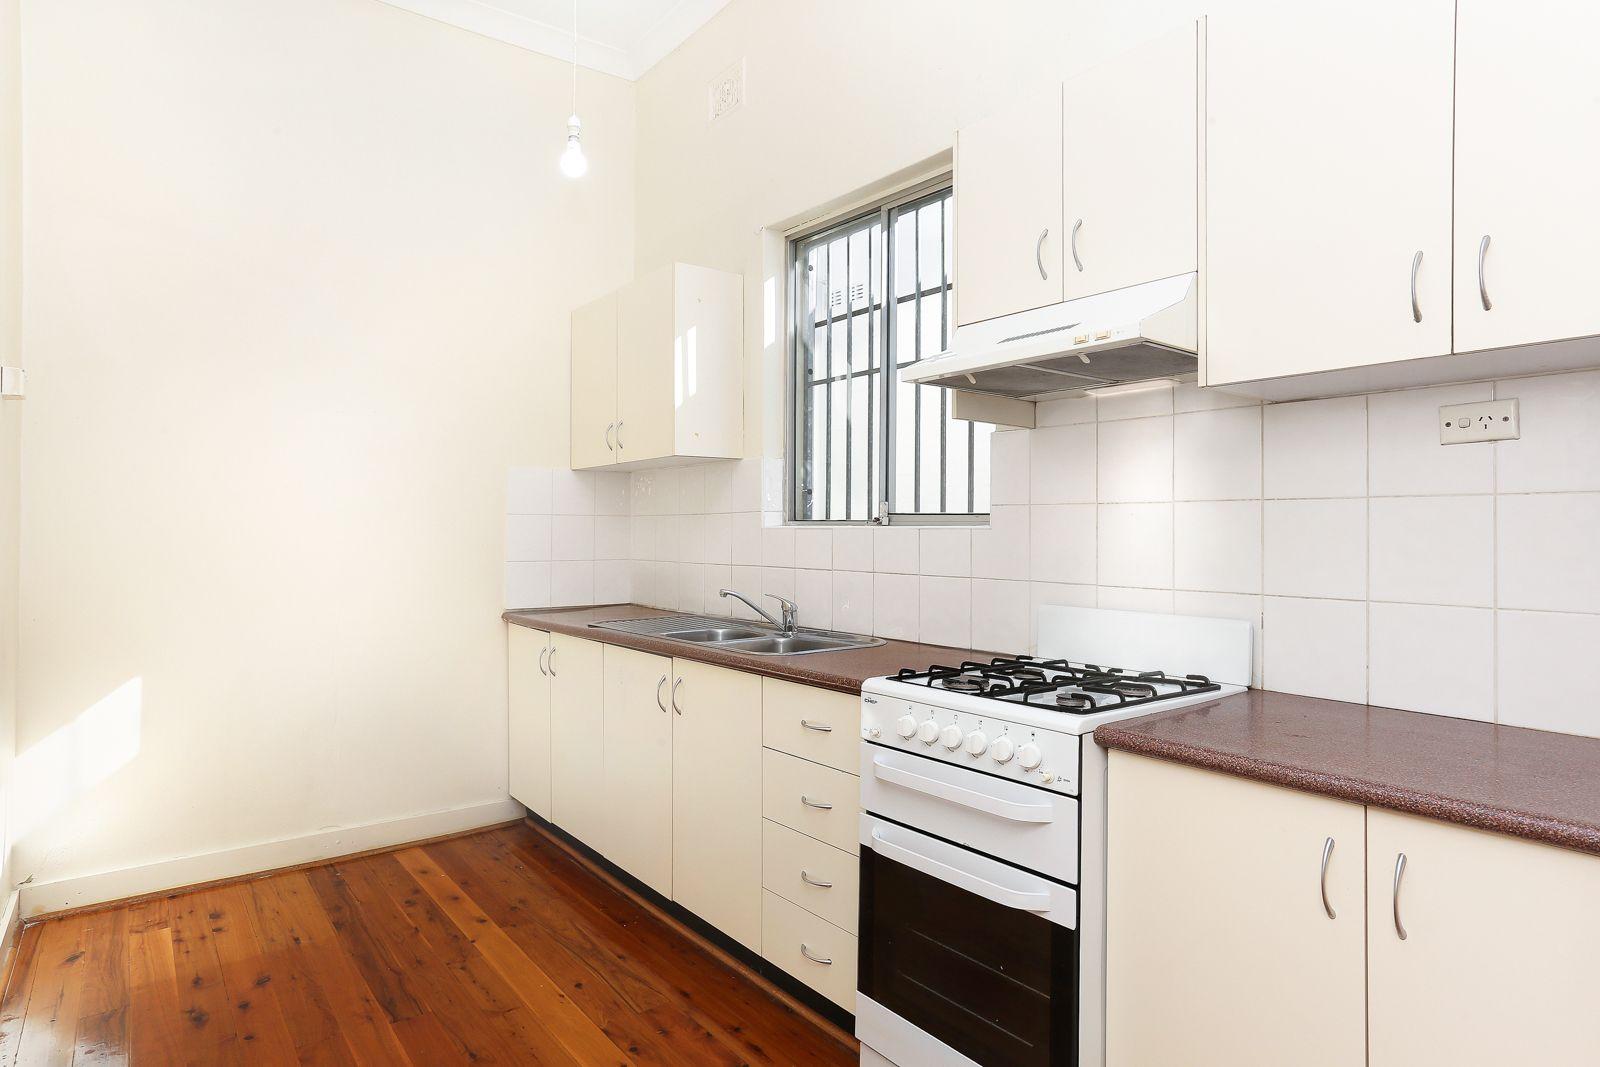 2/18 Elsmere Street, Kensington NSW 2033, Image 1